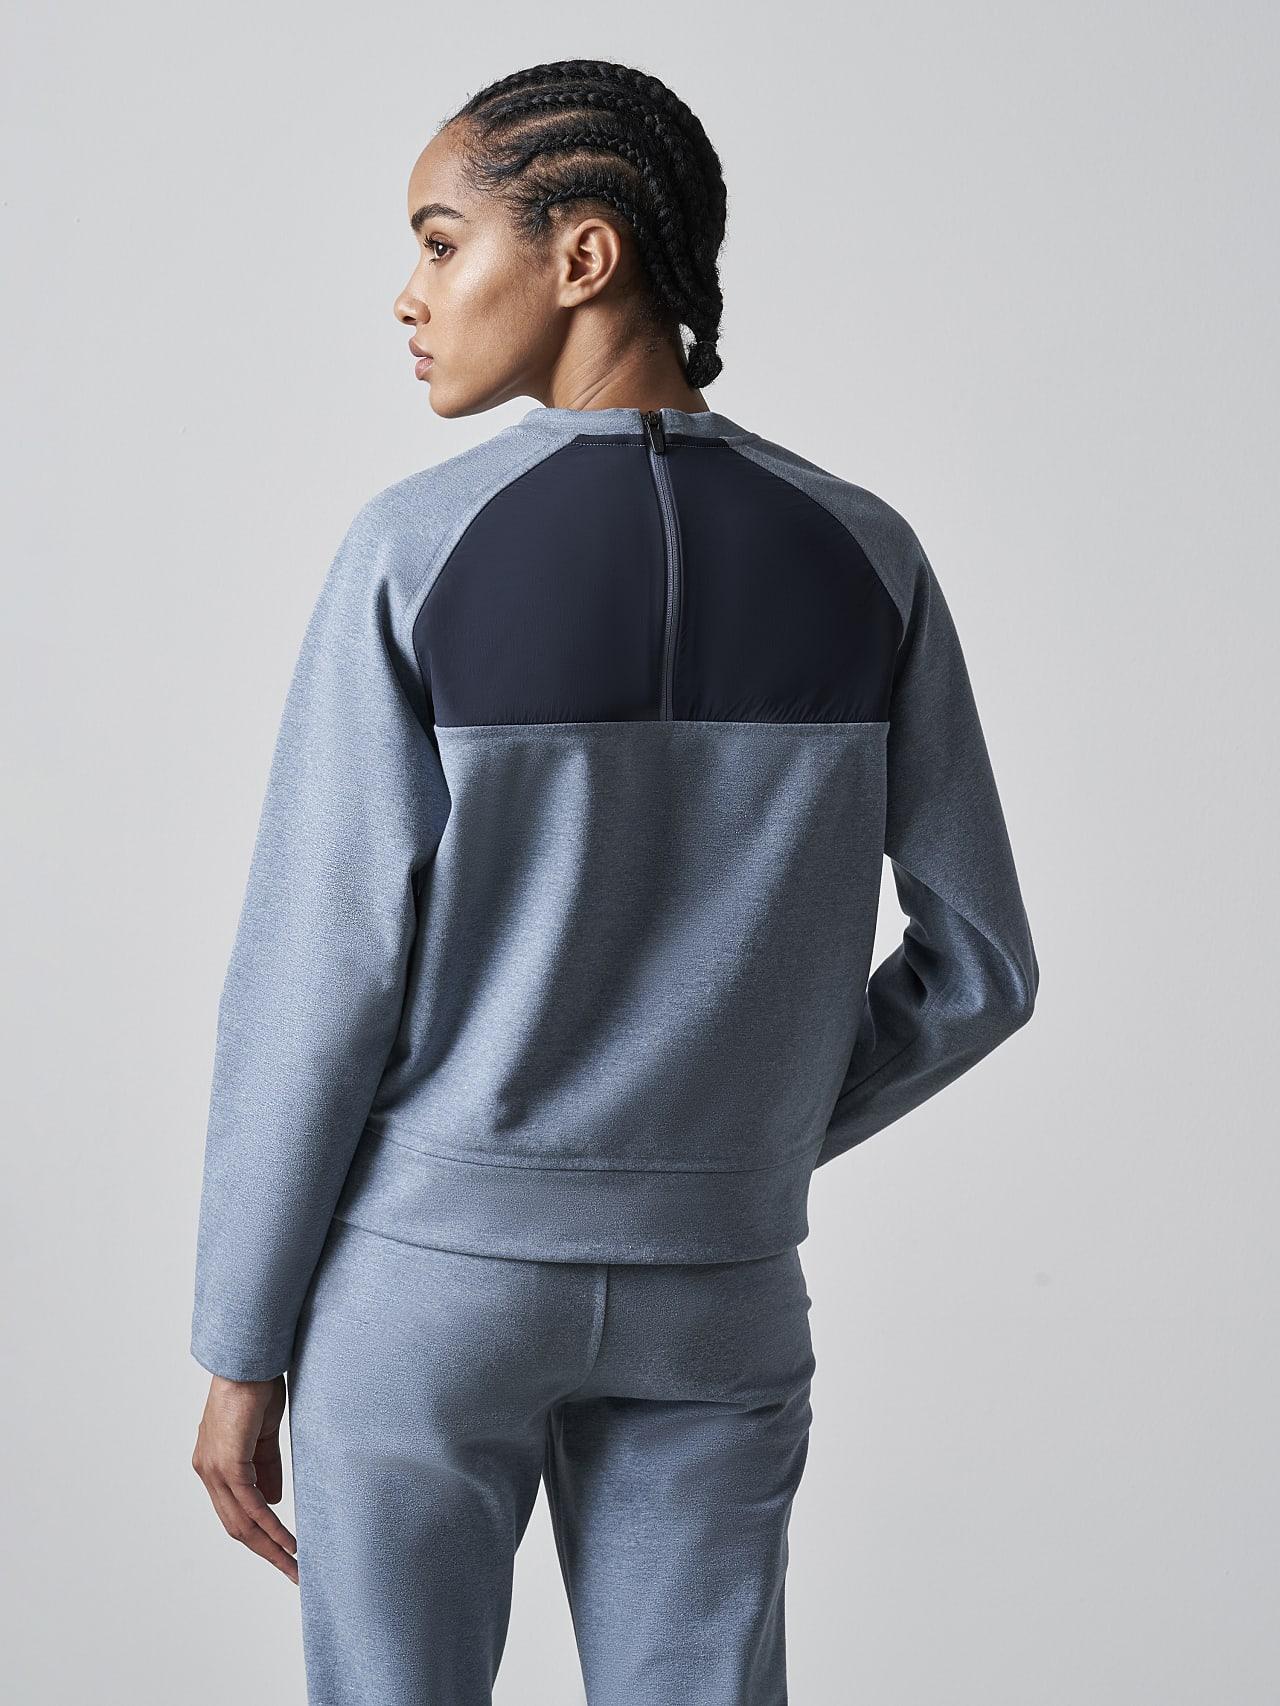 SRONI V2.Y5.02 Waterproof Sweatshirt medium blue Front Main Alpha Tauri